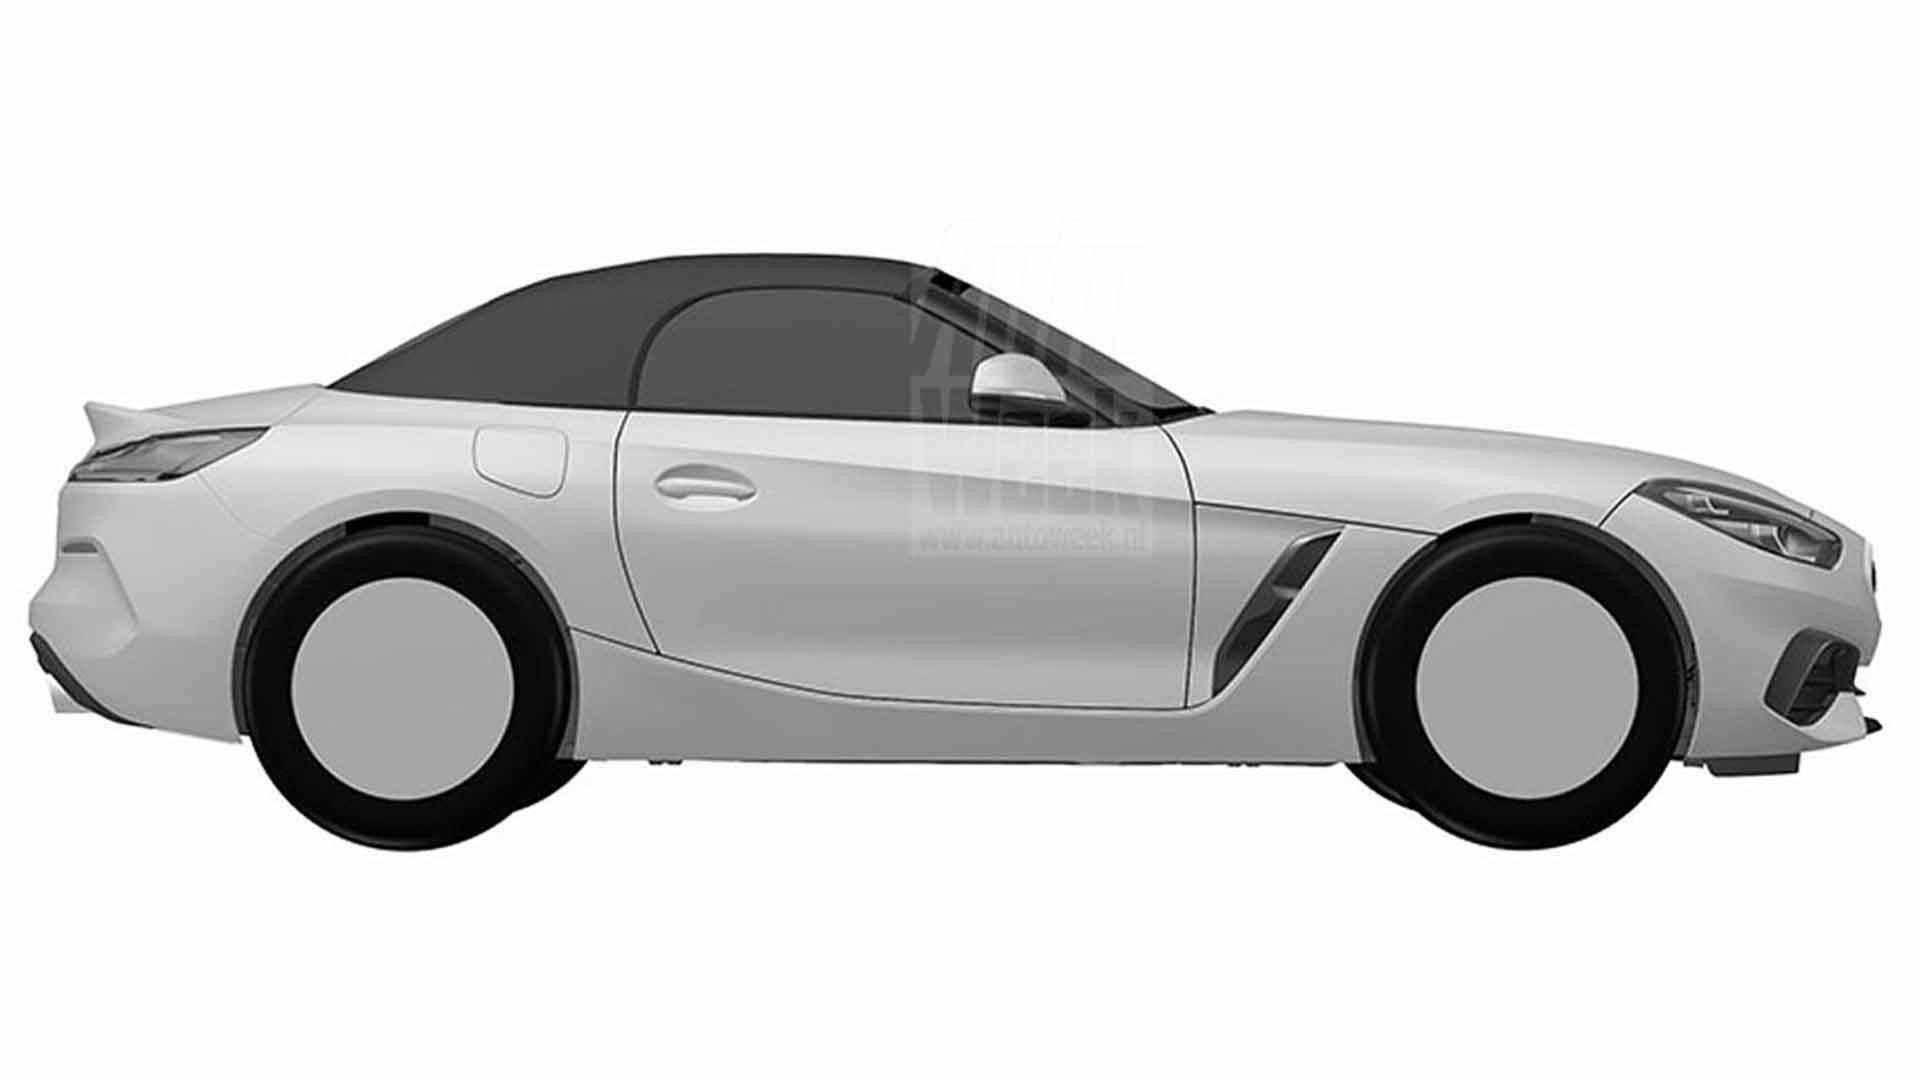 BMW Z4 Design Registration sketches (6)